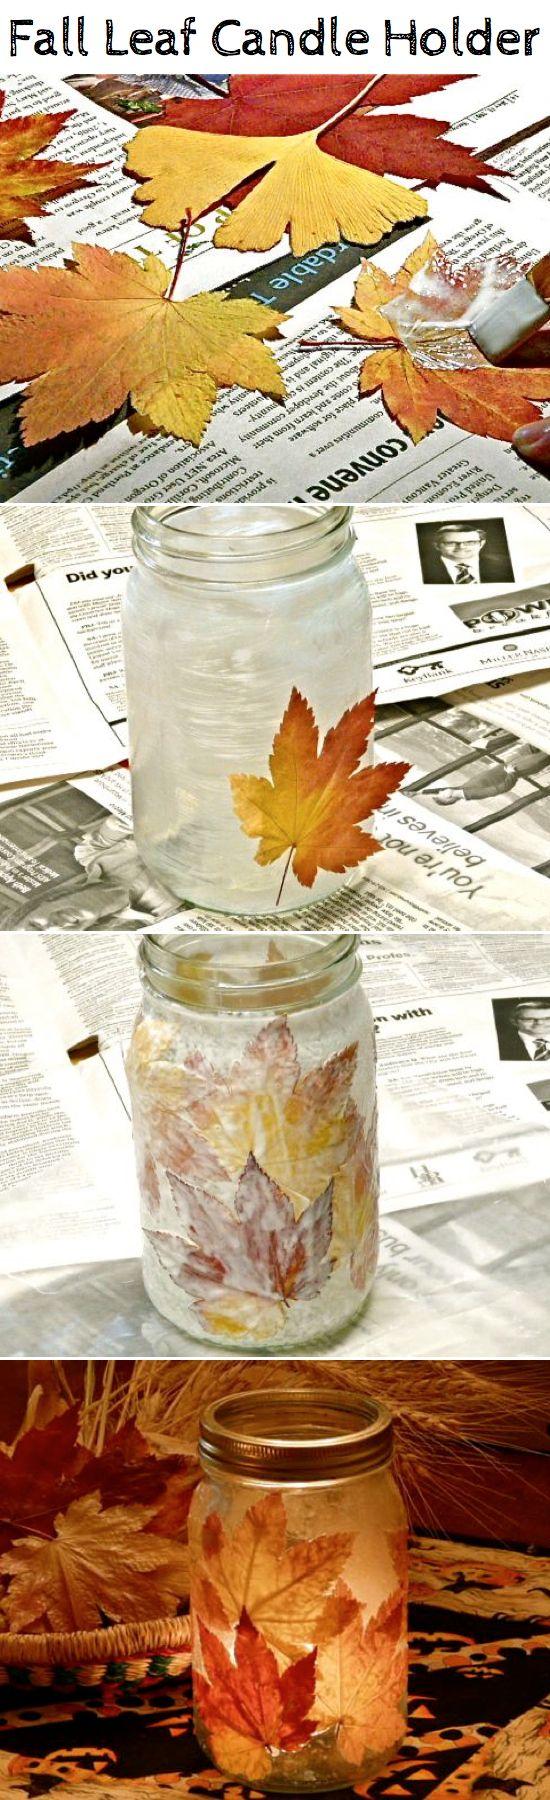 Diy halloween wedding decorations  DIY Fall Leaf Candle Holder  decoupage  Pinterest  Fall leaves